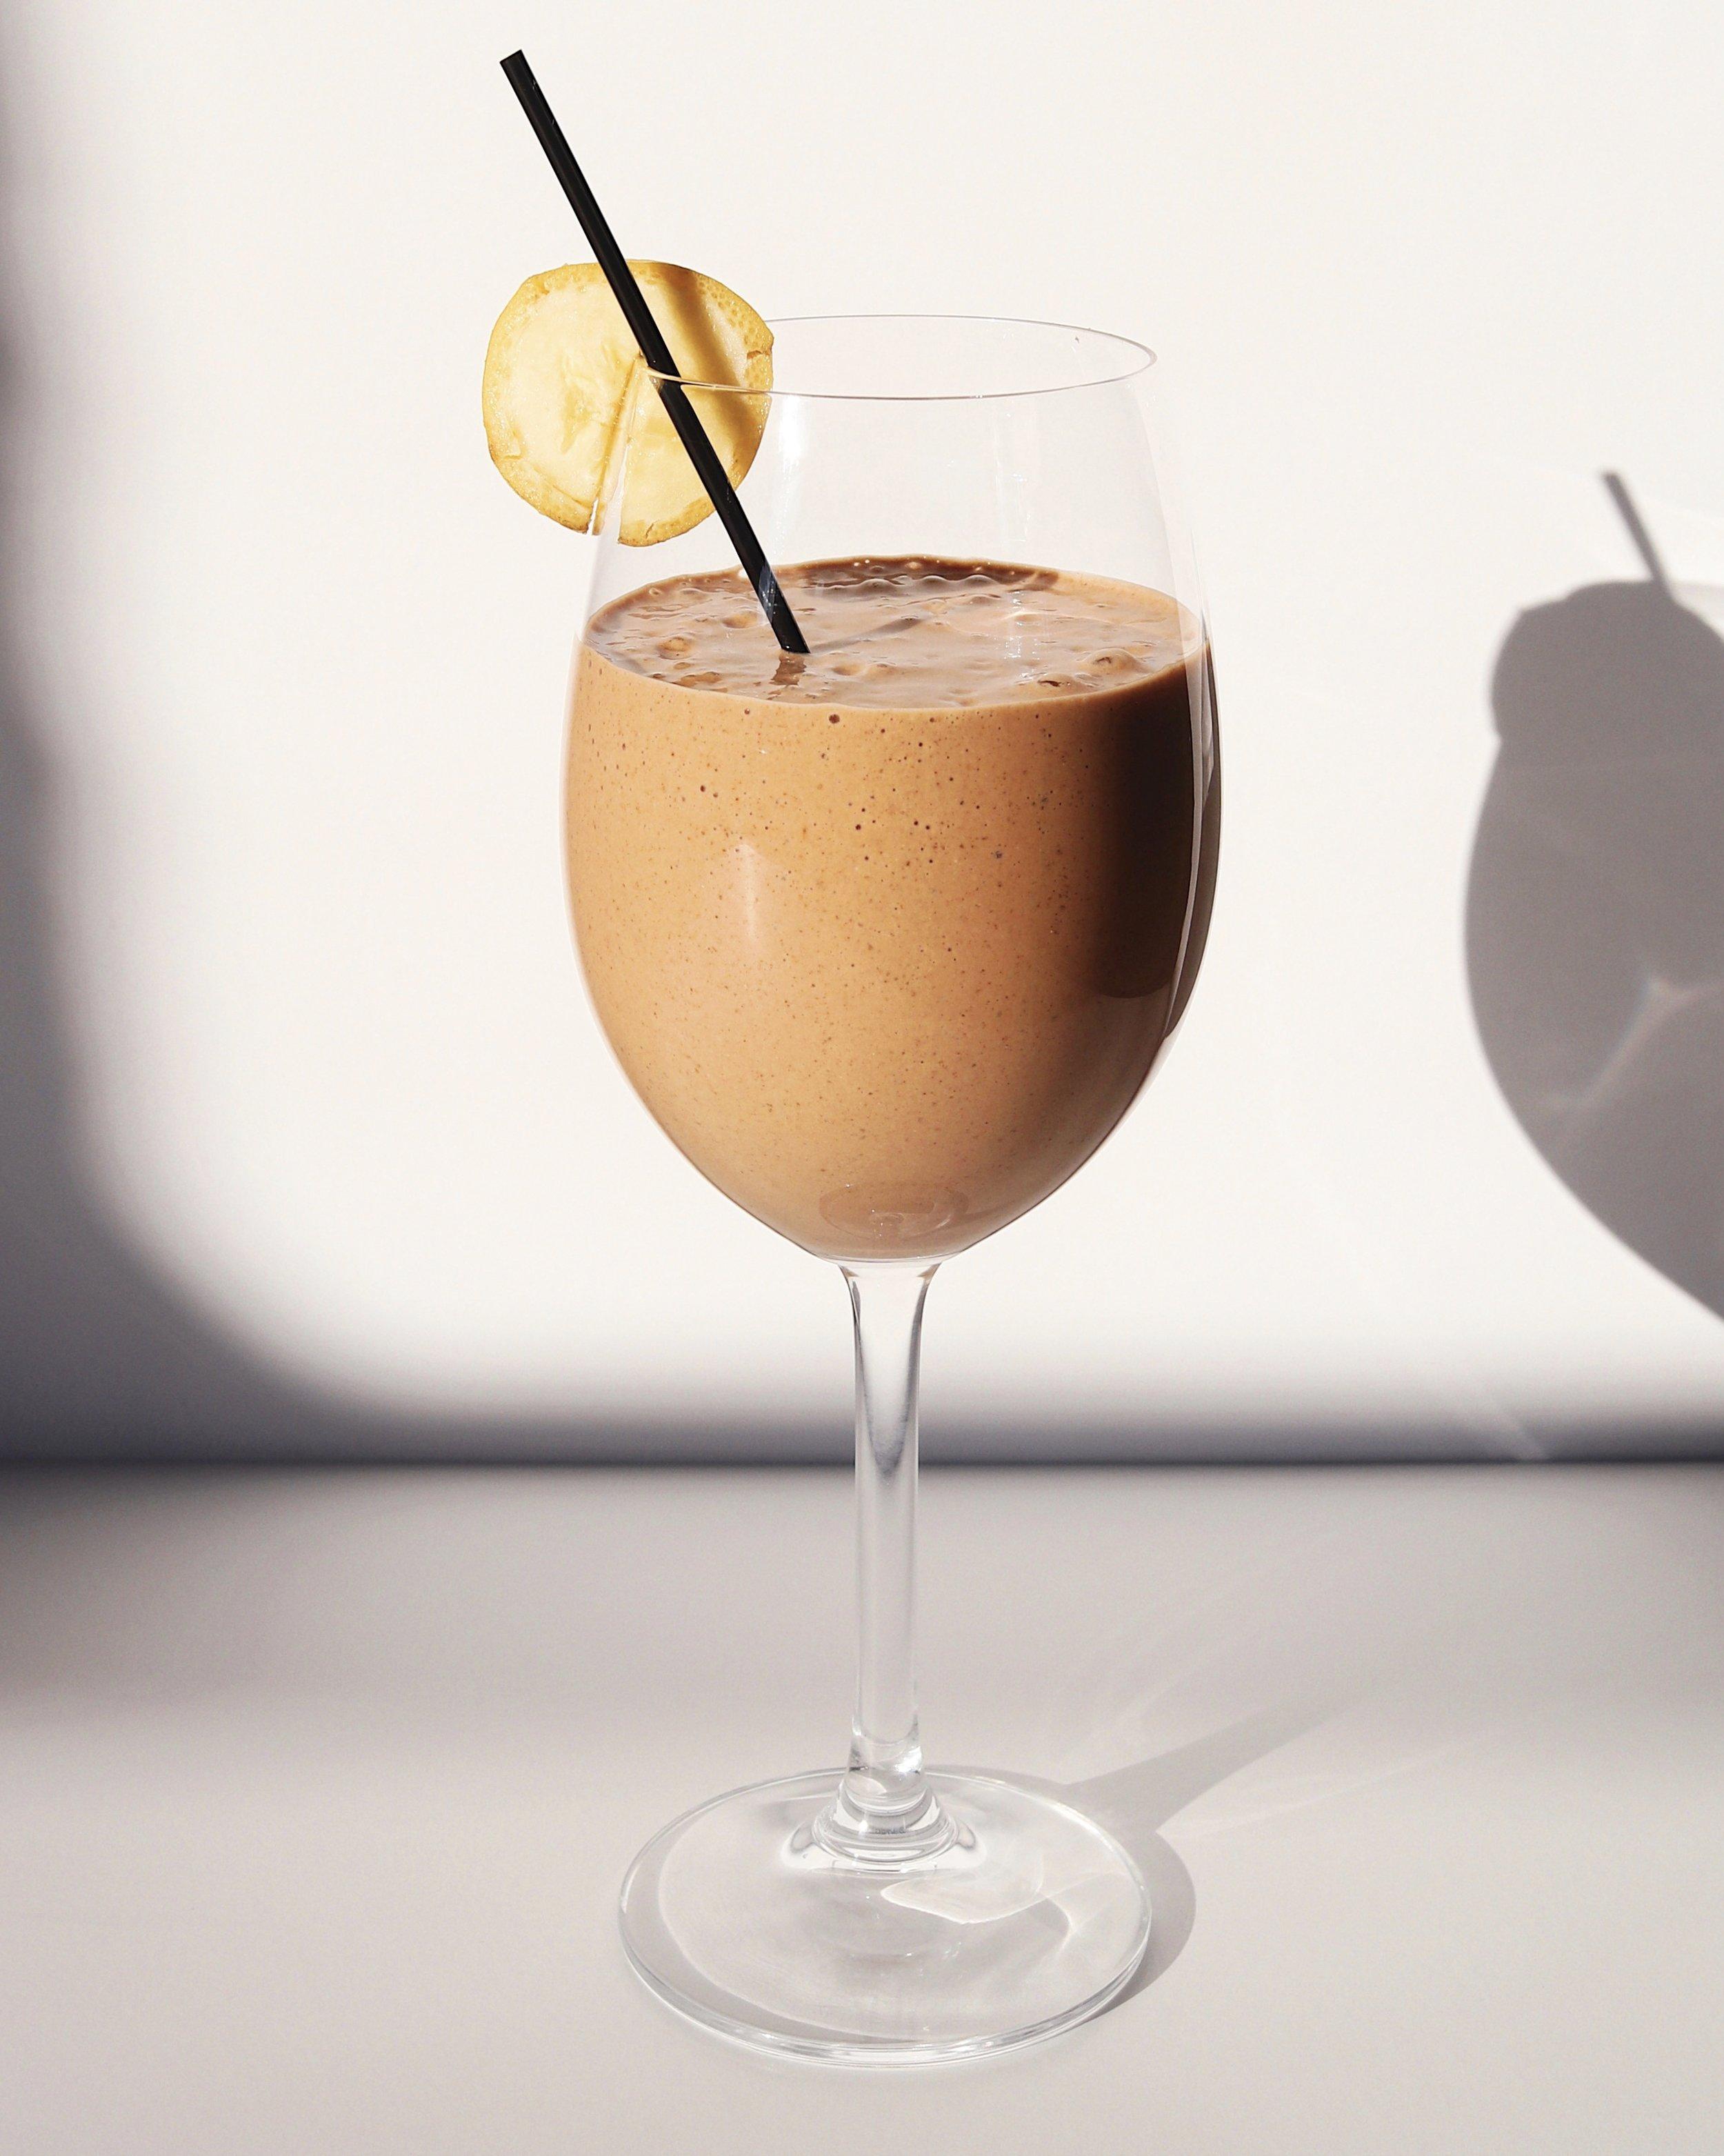 Cacaochocolatepeanutbuttersmoothiewholydose.jpg